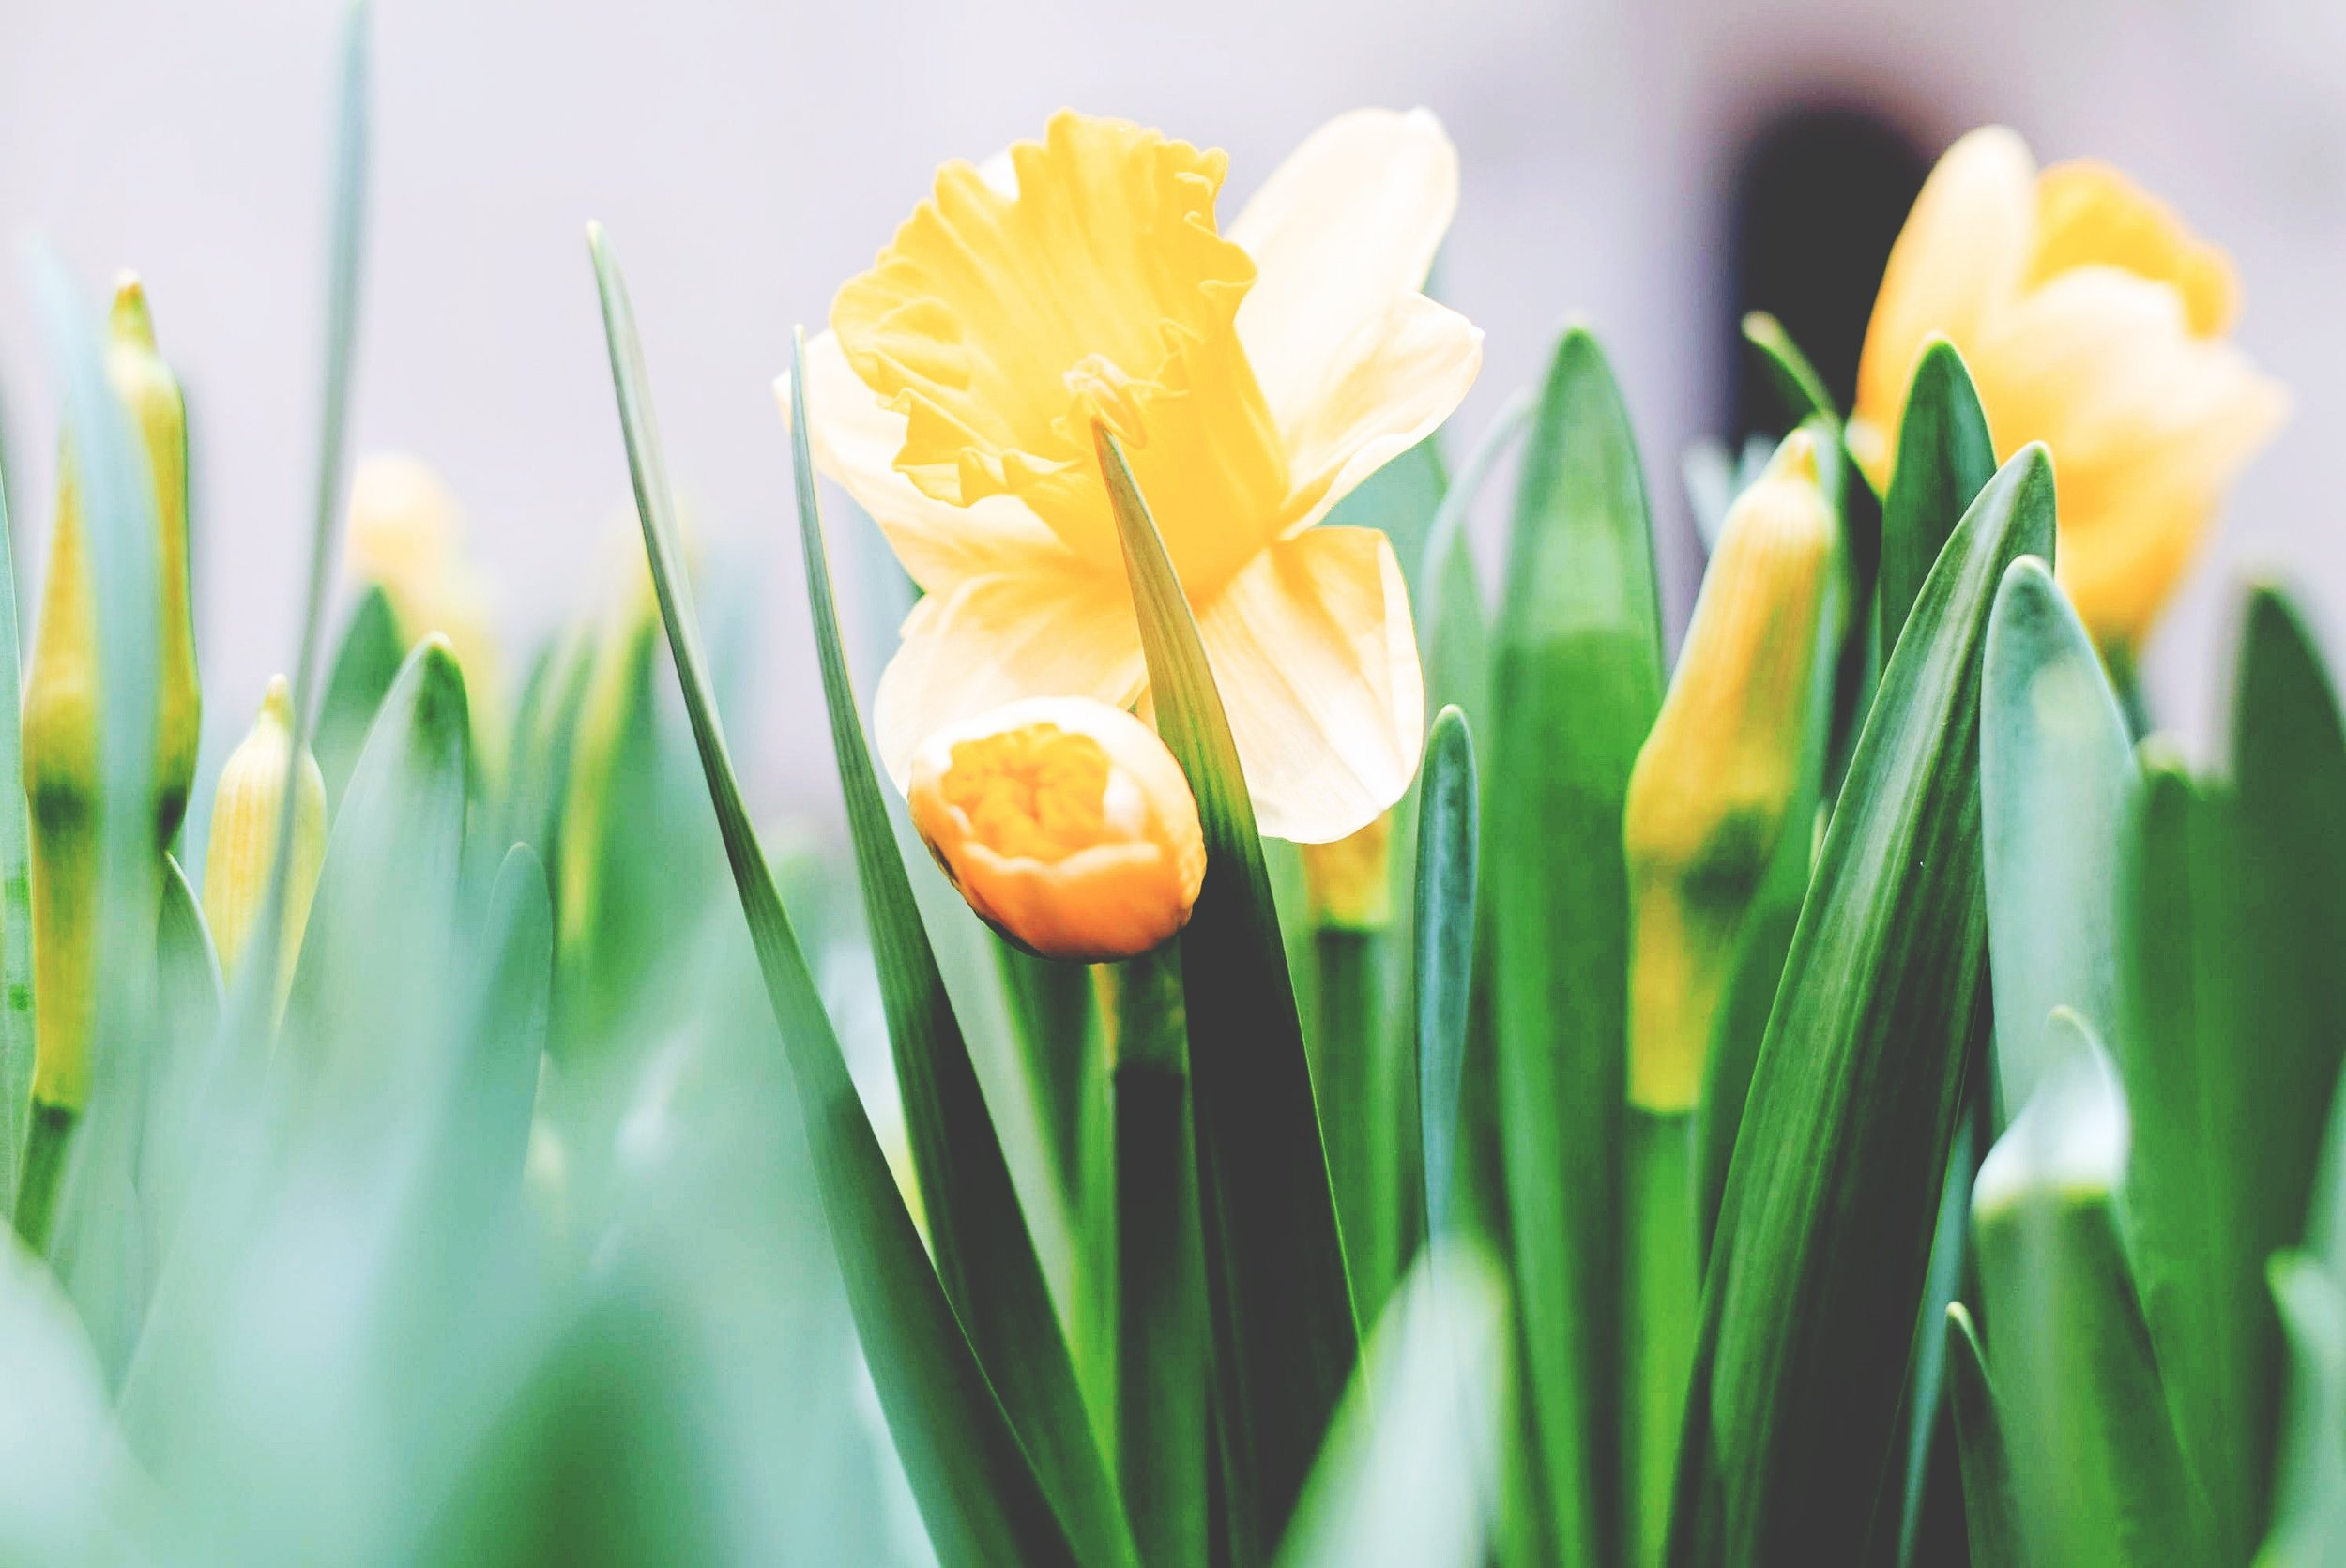 preach counter-cultural lent peter wallace daffodils tim-gouw-239228-unsplash.jpg